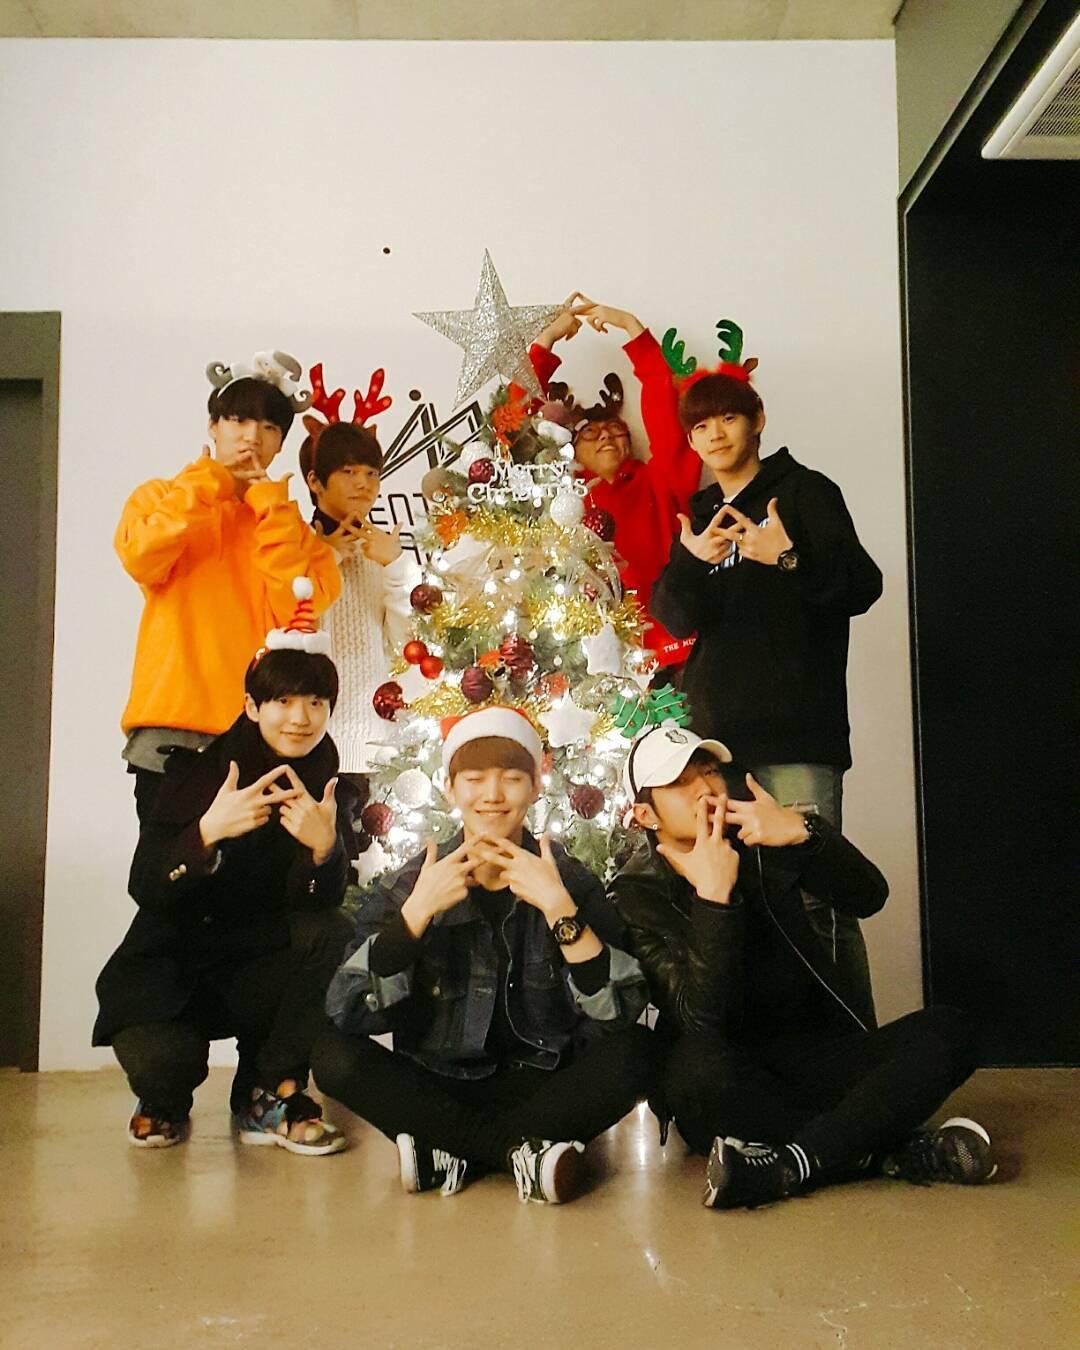 kpop, kpop 2017, kpop rookies 2017, kpop debut 2017, 2017 debut, 2017 kpop debut, wm boys, wm boys debut, wm boys 2017